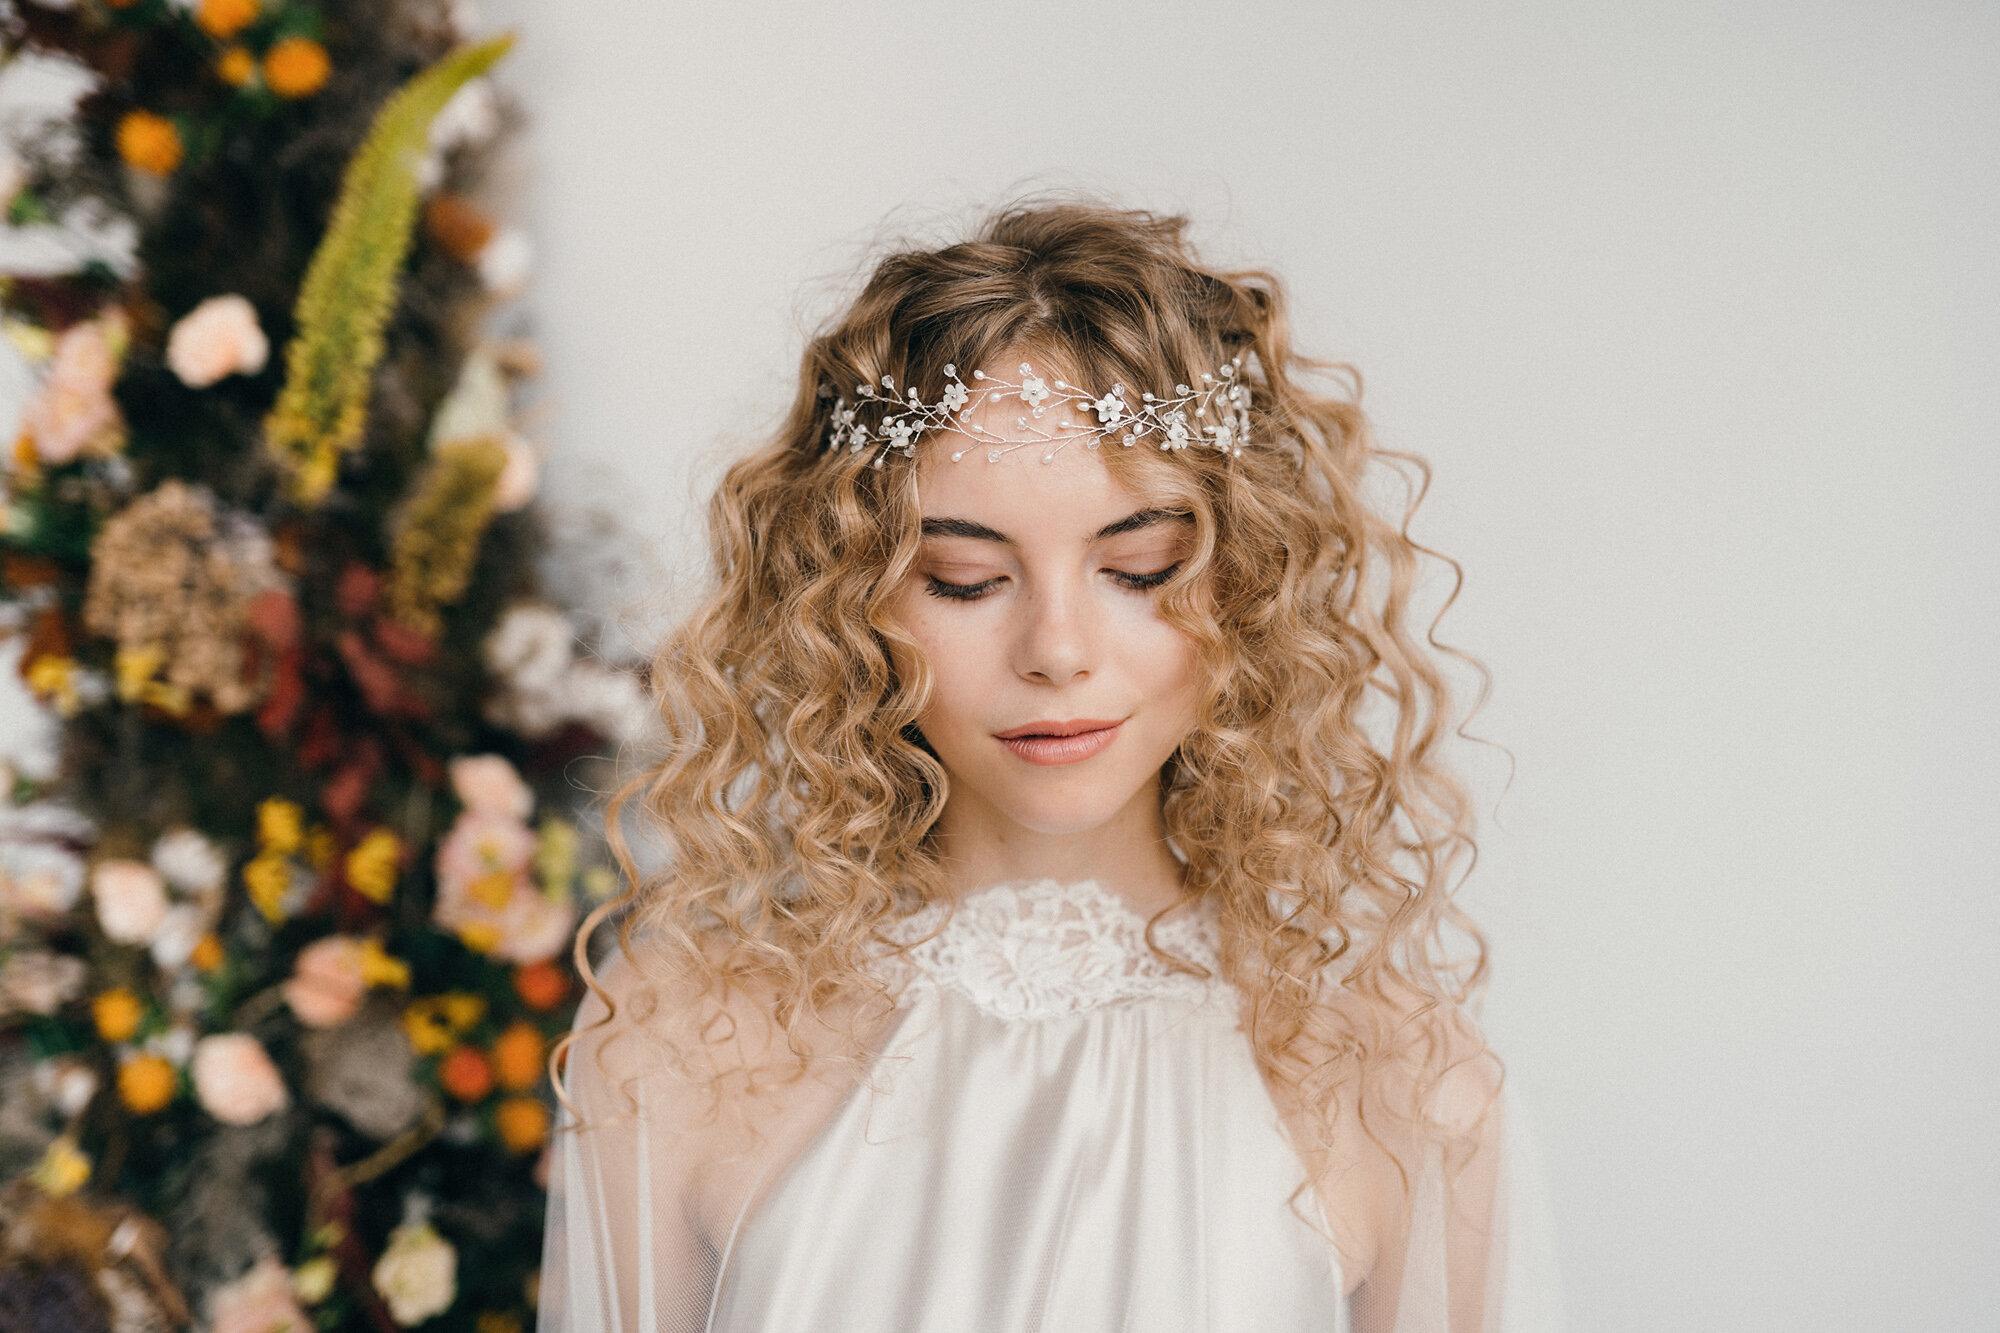 Debbie-Carlisle-Bridal-Accessories-Kate-Beaumont-Wedding-Gowns-Sheffield-Yorkshire-UK-15.jpg